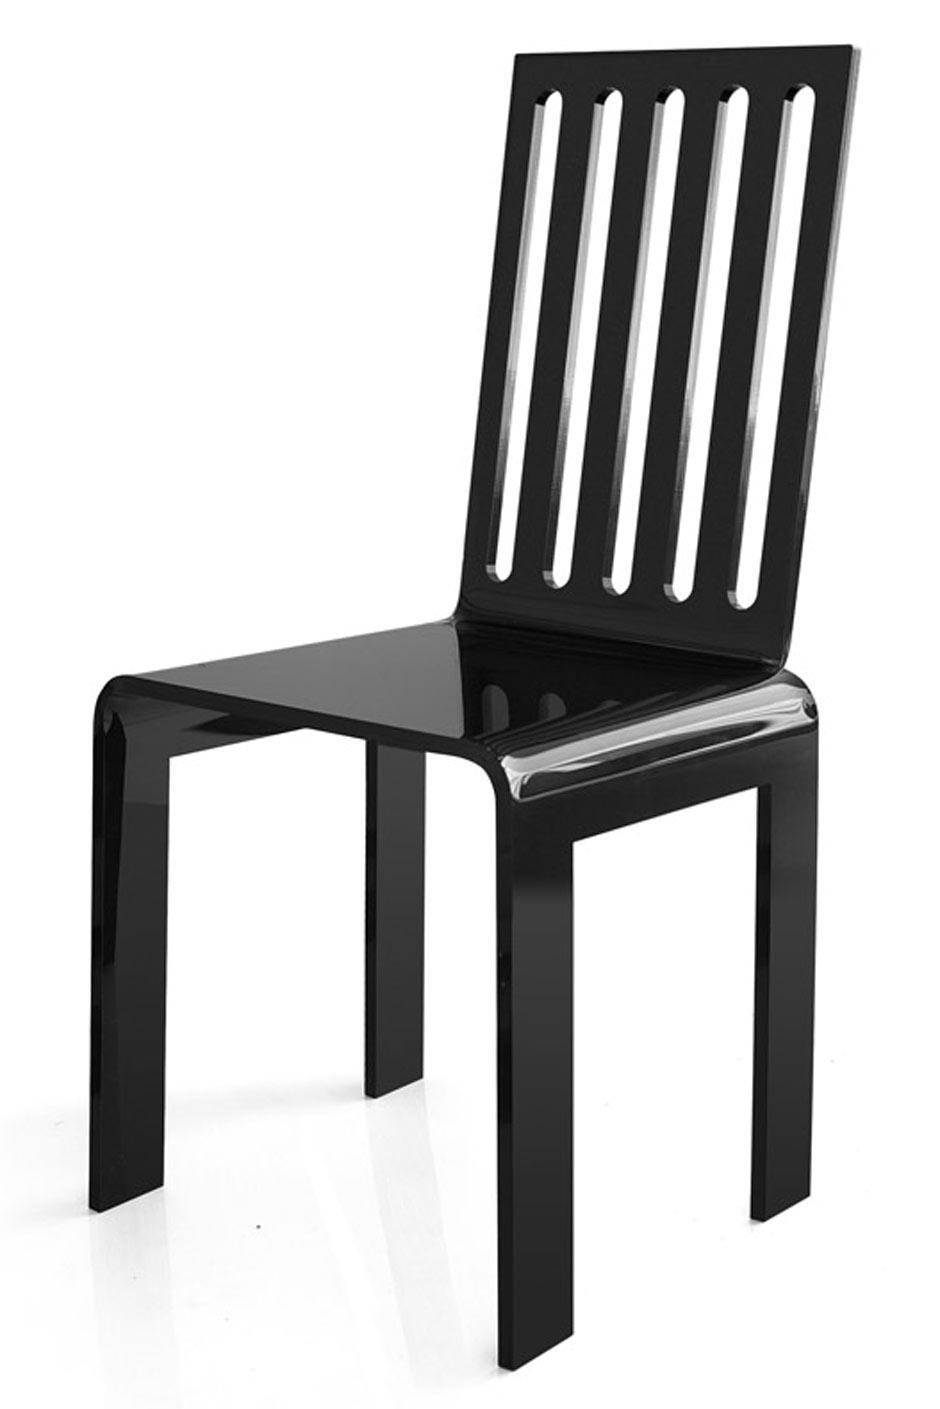 Chaise plexiglas noir barreaux grand soir acrila for Chaise a barreaux